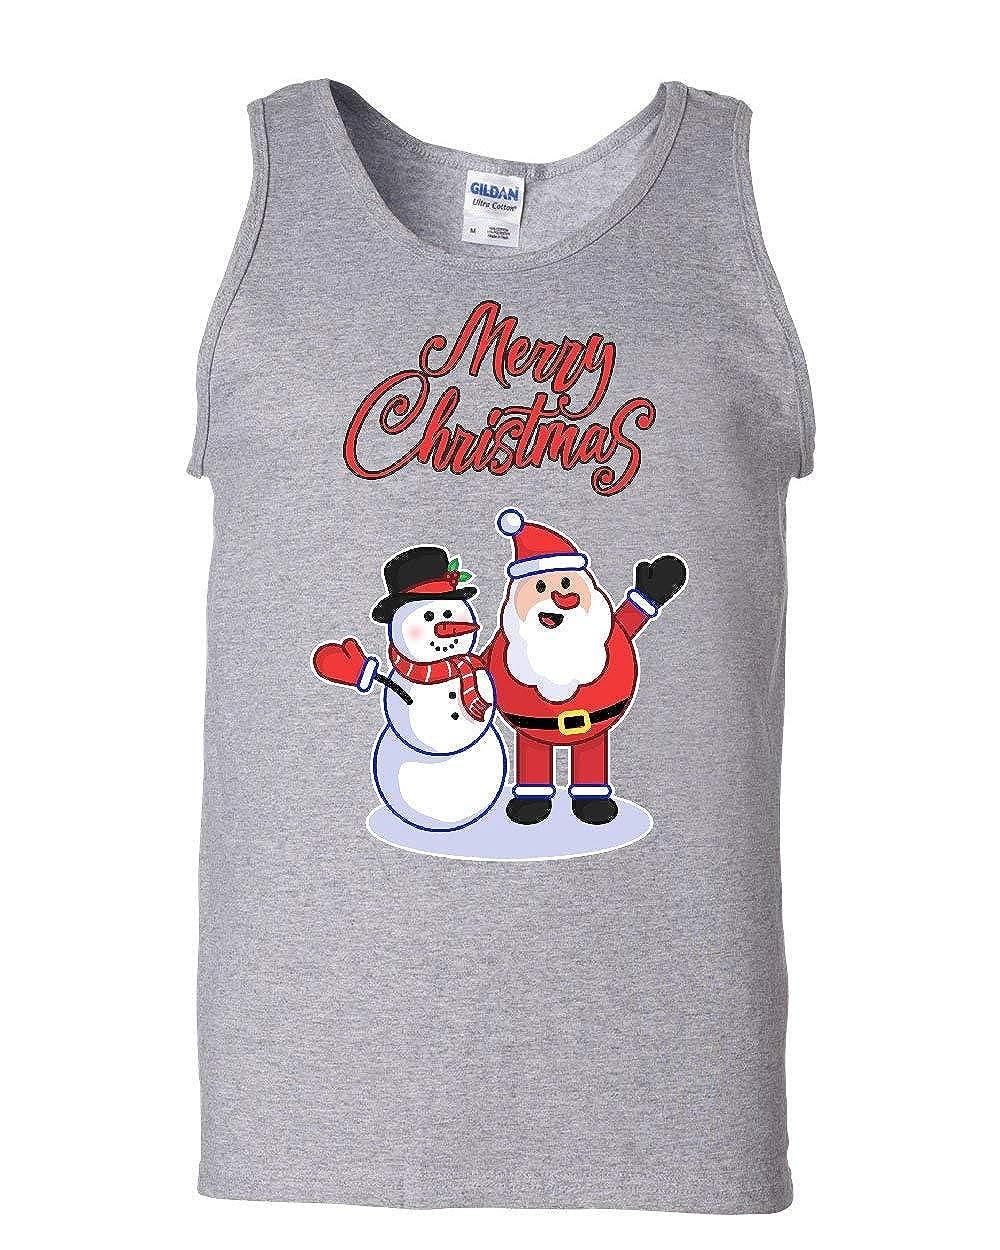 Merry Christmas Santa Snowman Hug Tank Top Xmas Holiday Spirit Sleeveless